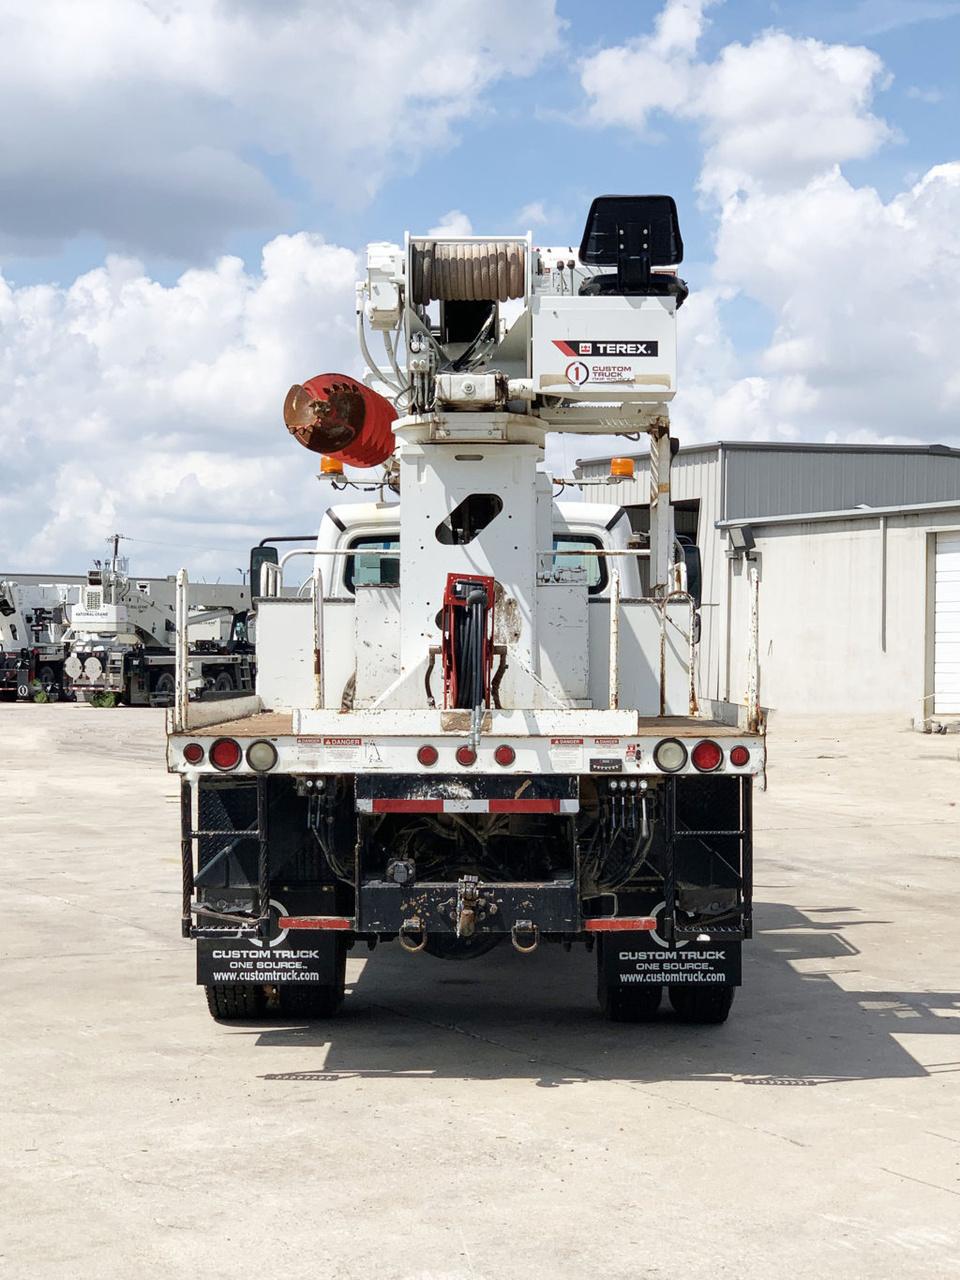 Terex Commander 4047 Digger Derrick on 2015 Freightliner M2106 4x4